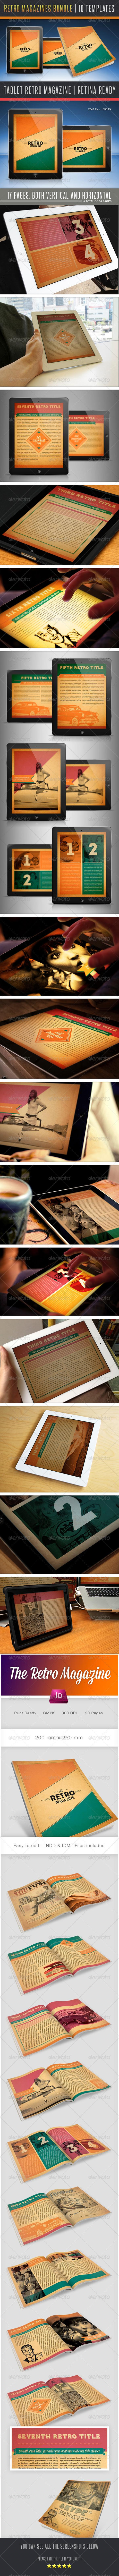 The Retro MGZ Print & Digital - Magazines Print Templates